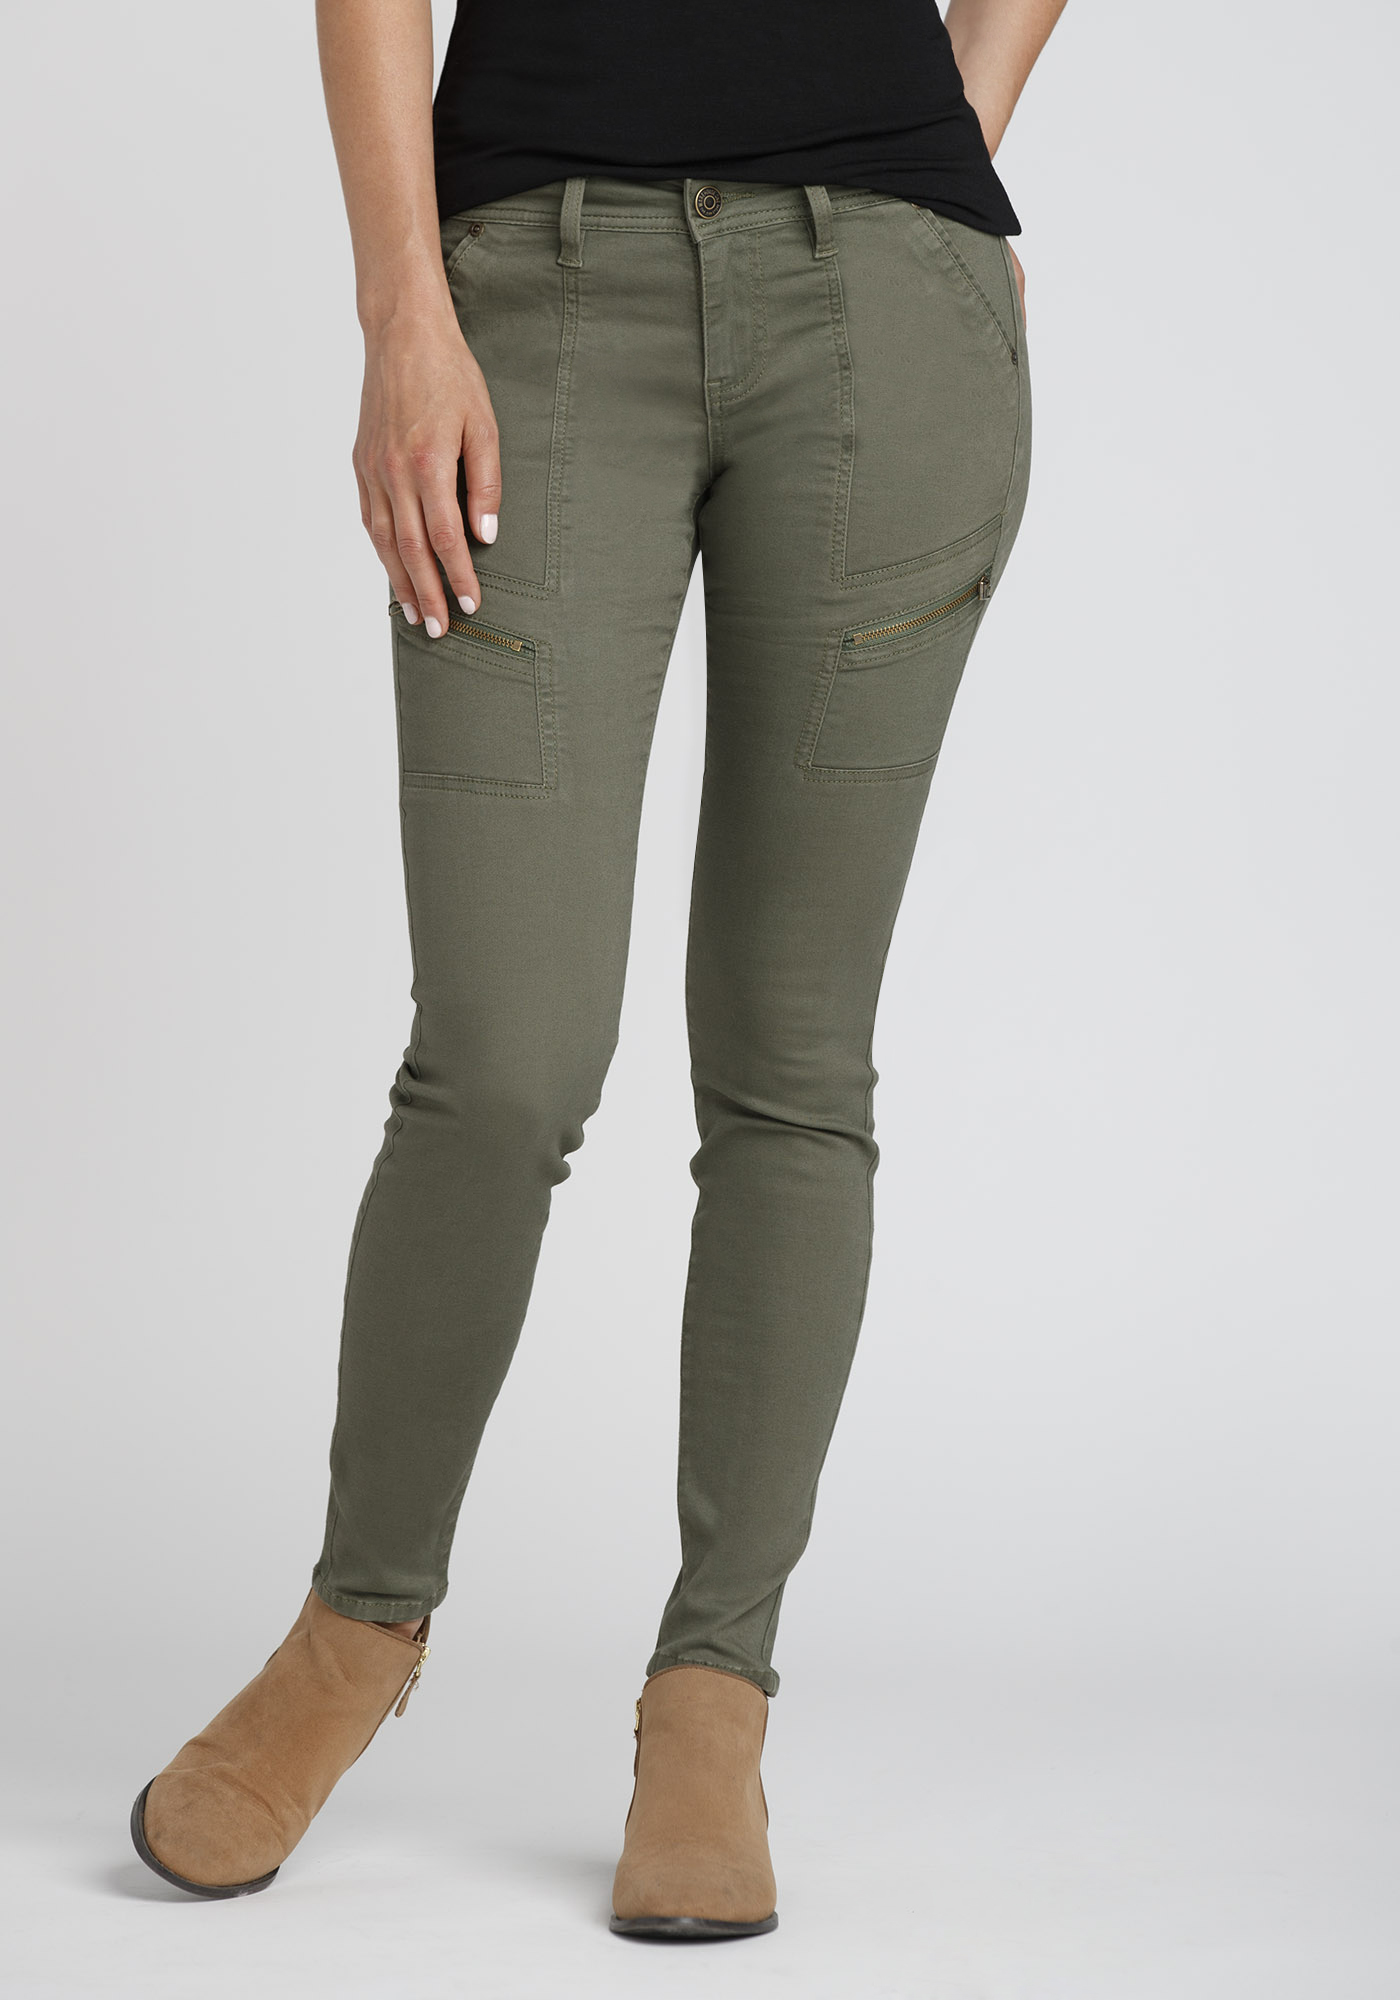 fe651d6f Women's Cargo Skinny Pants | Warehouse One